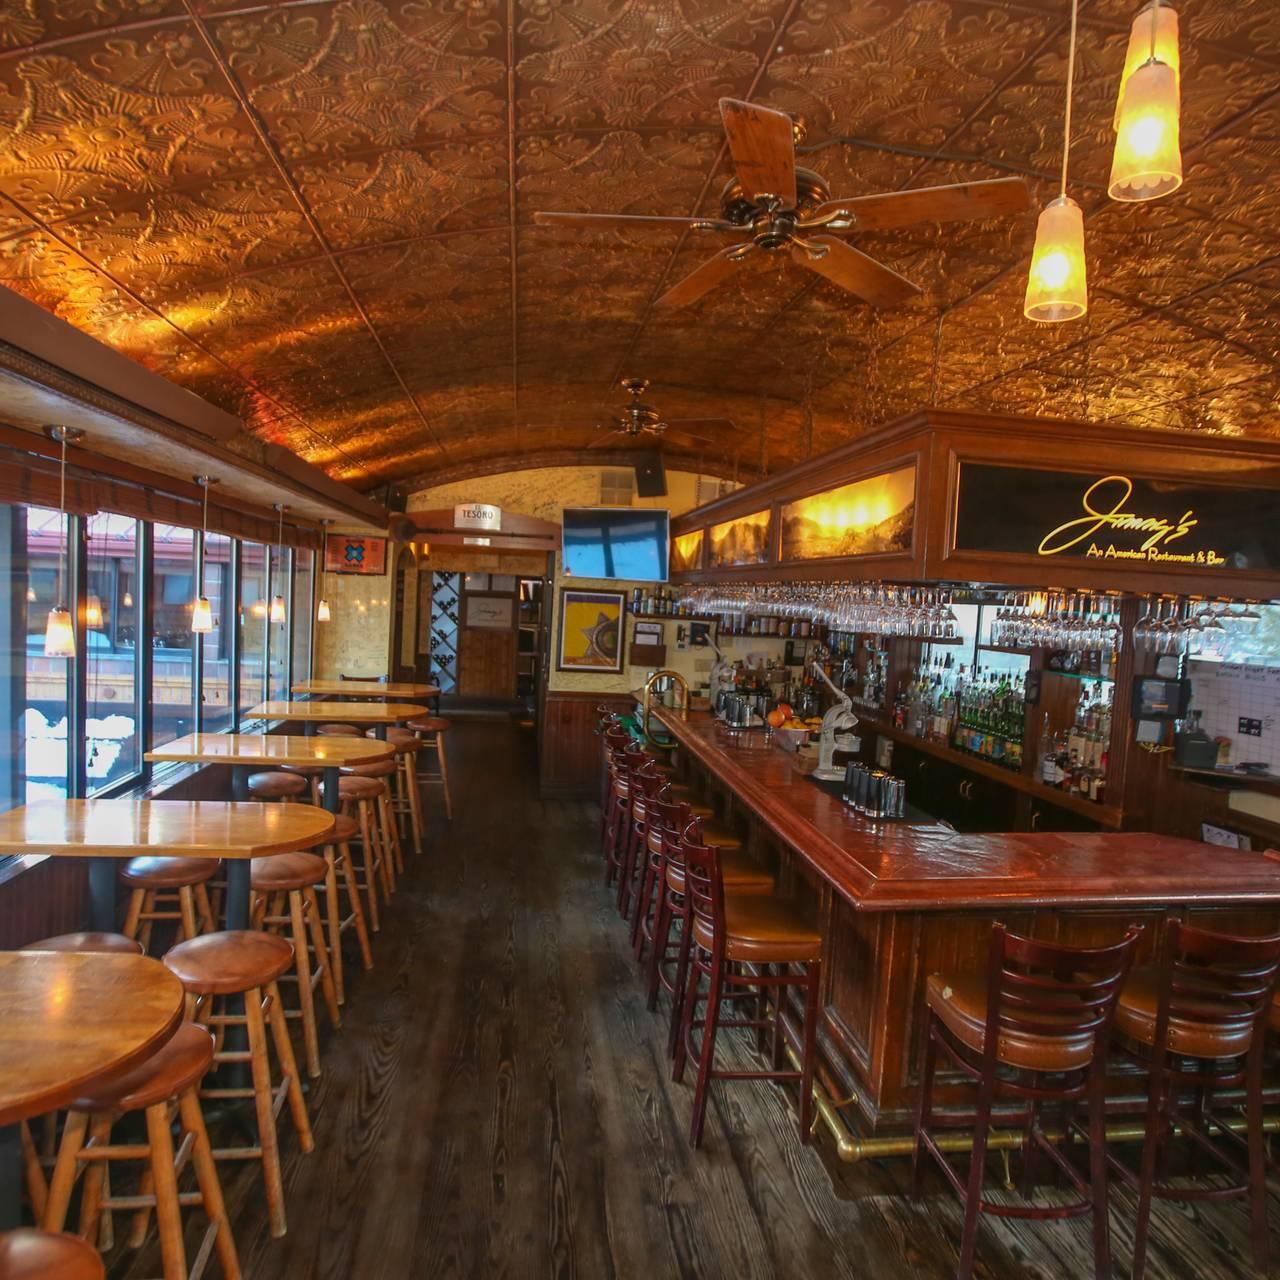 Jimmy S An American Restaurant Bar Aspen Co Opentable